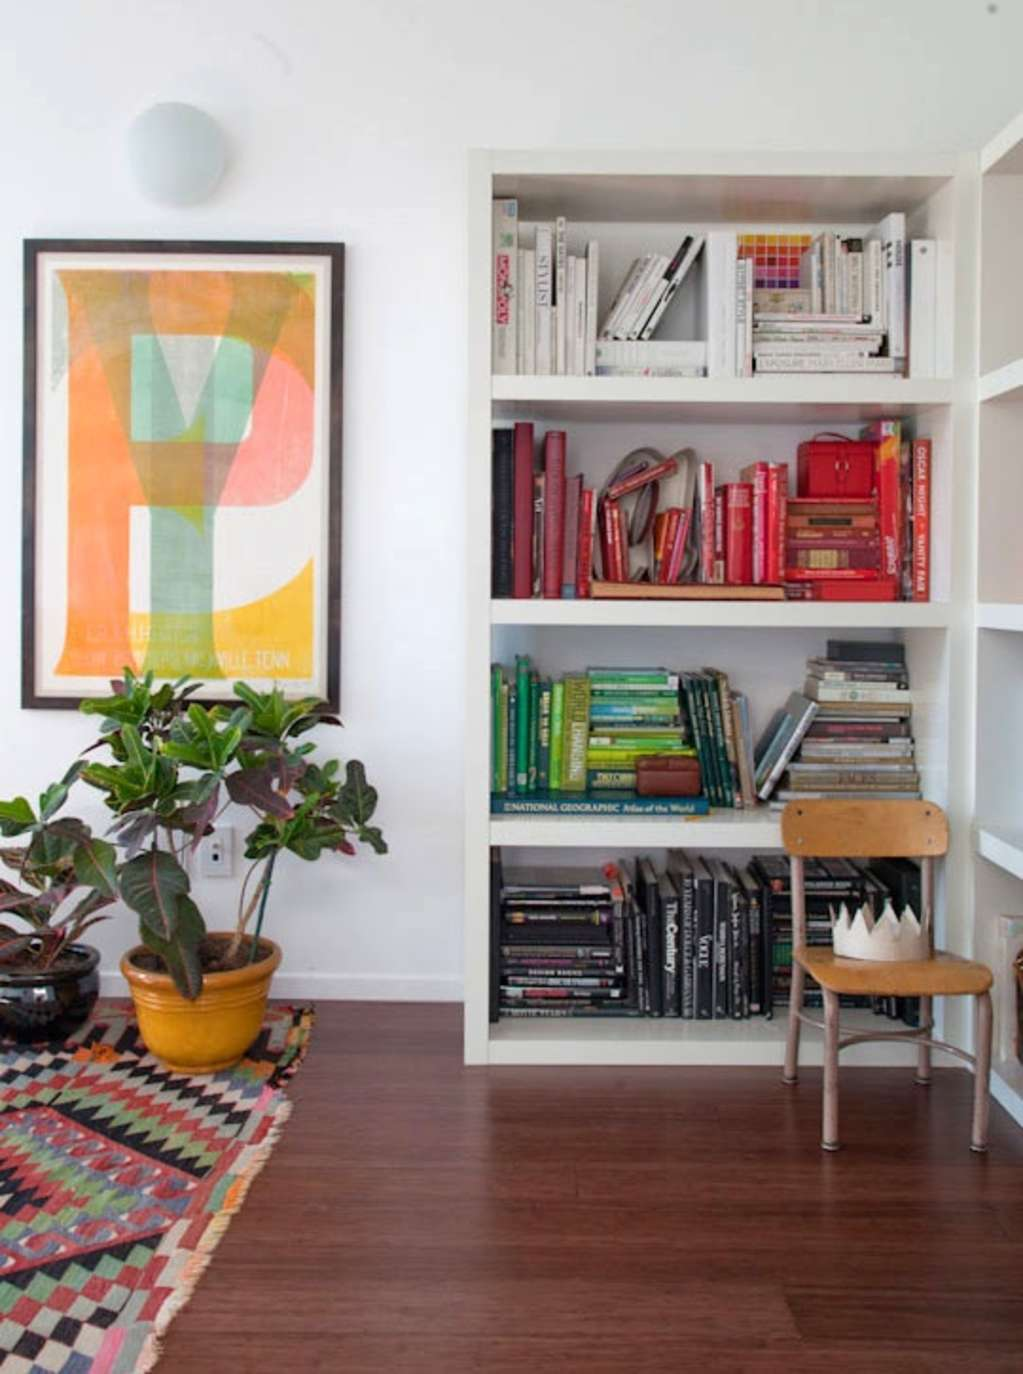 7 Secret Spots to Hide Valuables at Home